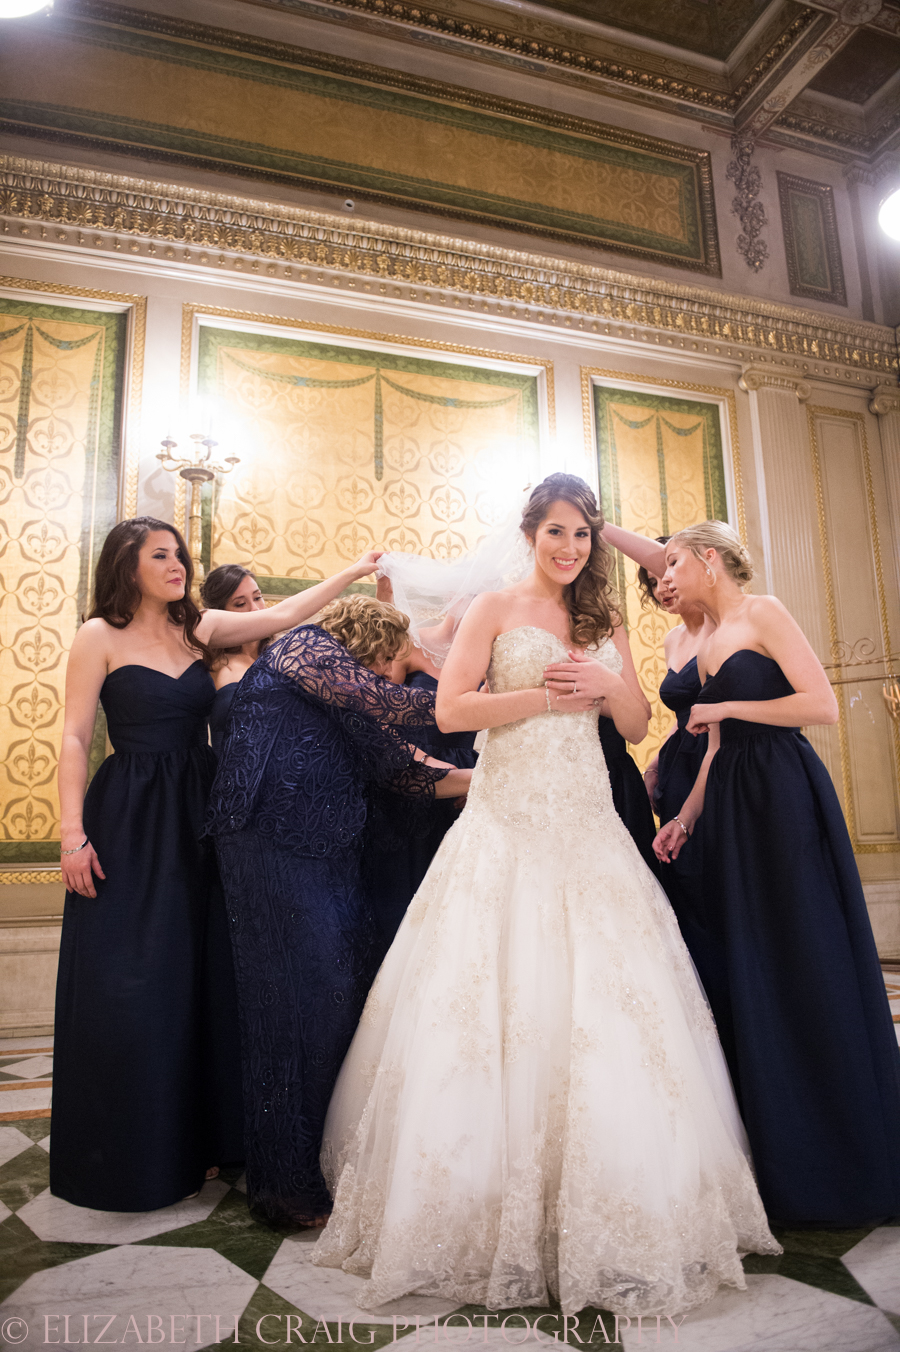 Carnegie Museum of Art Weddings | Elizabeth Craig Photography-0030